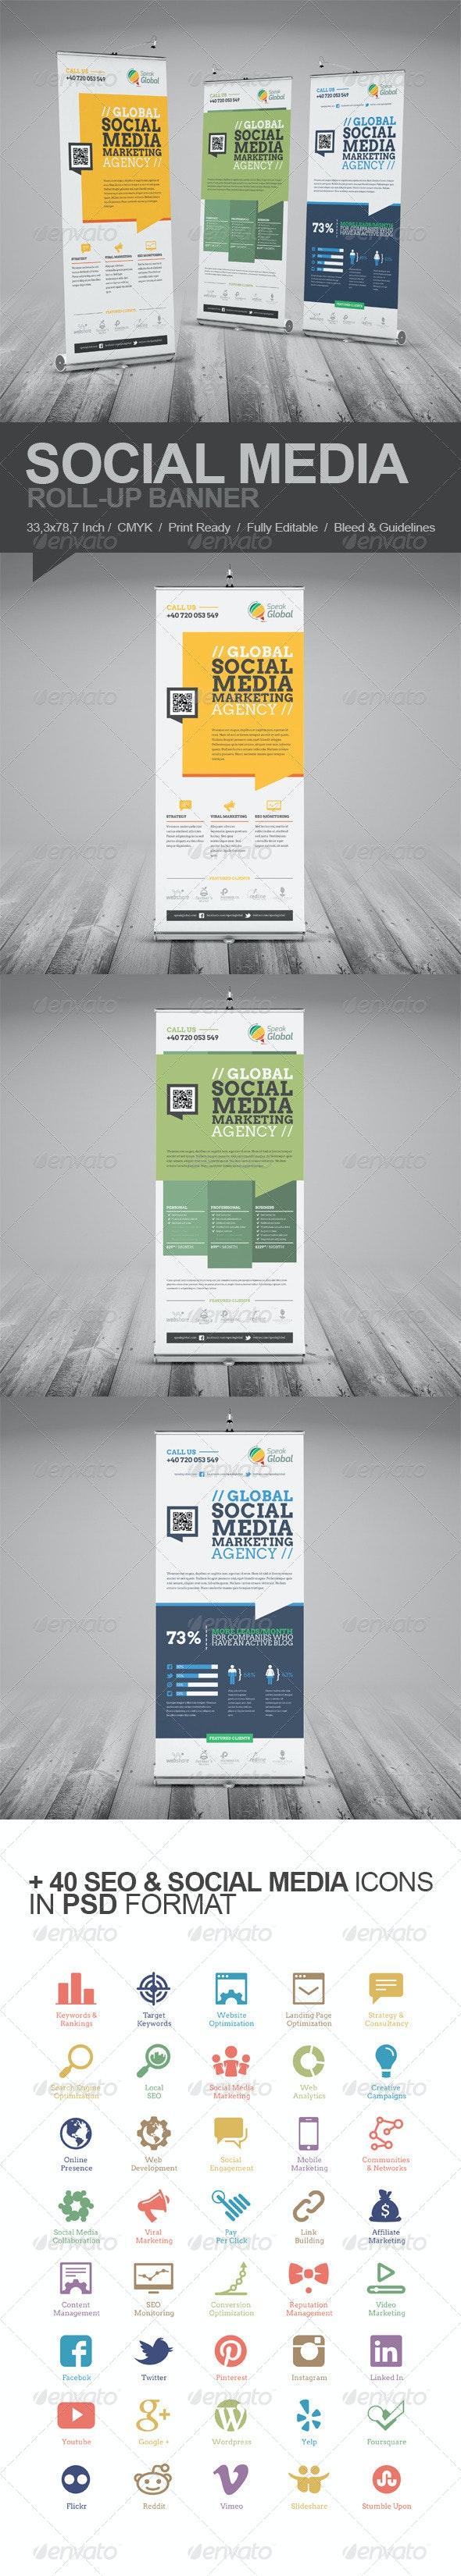 Social Media Marketing Roll-Up Banner - Signage Print Templates